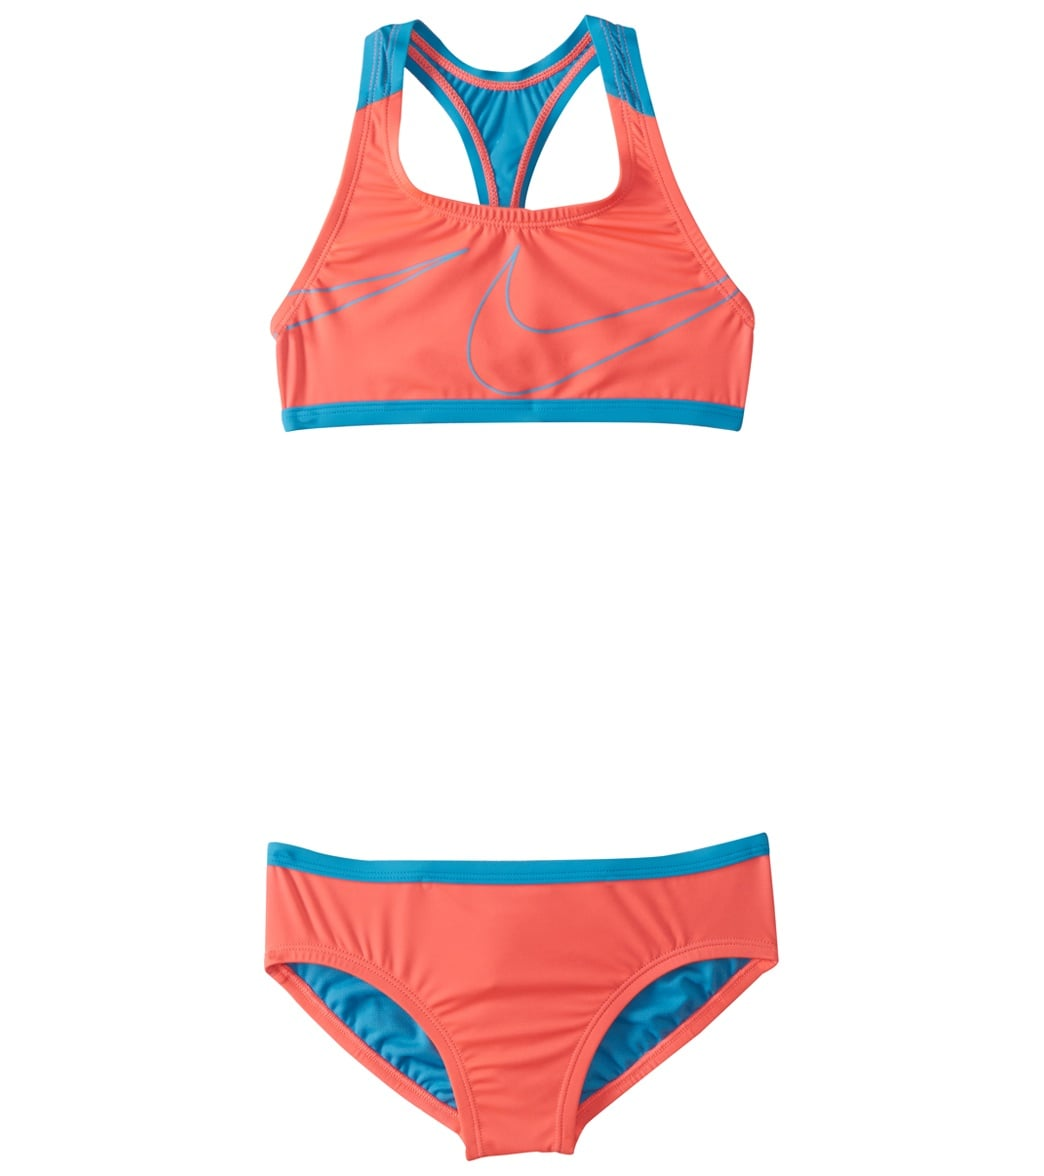 a0b75868ed17 Nike Girls' Racerback Sport Two Piece Bikini Swim Set (Big Kid) at  SwimOutlet.com